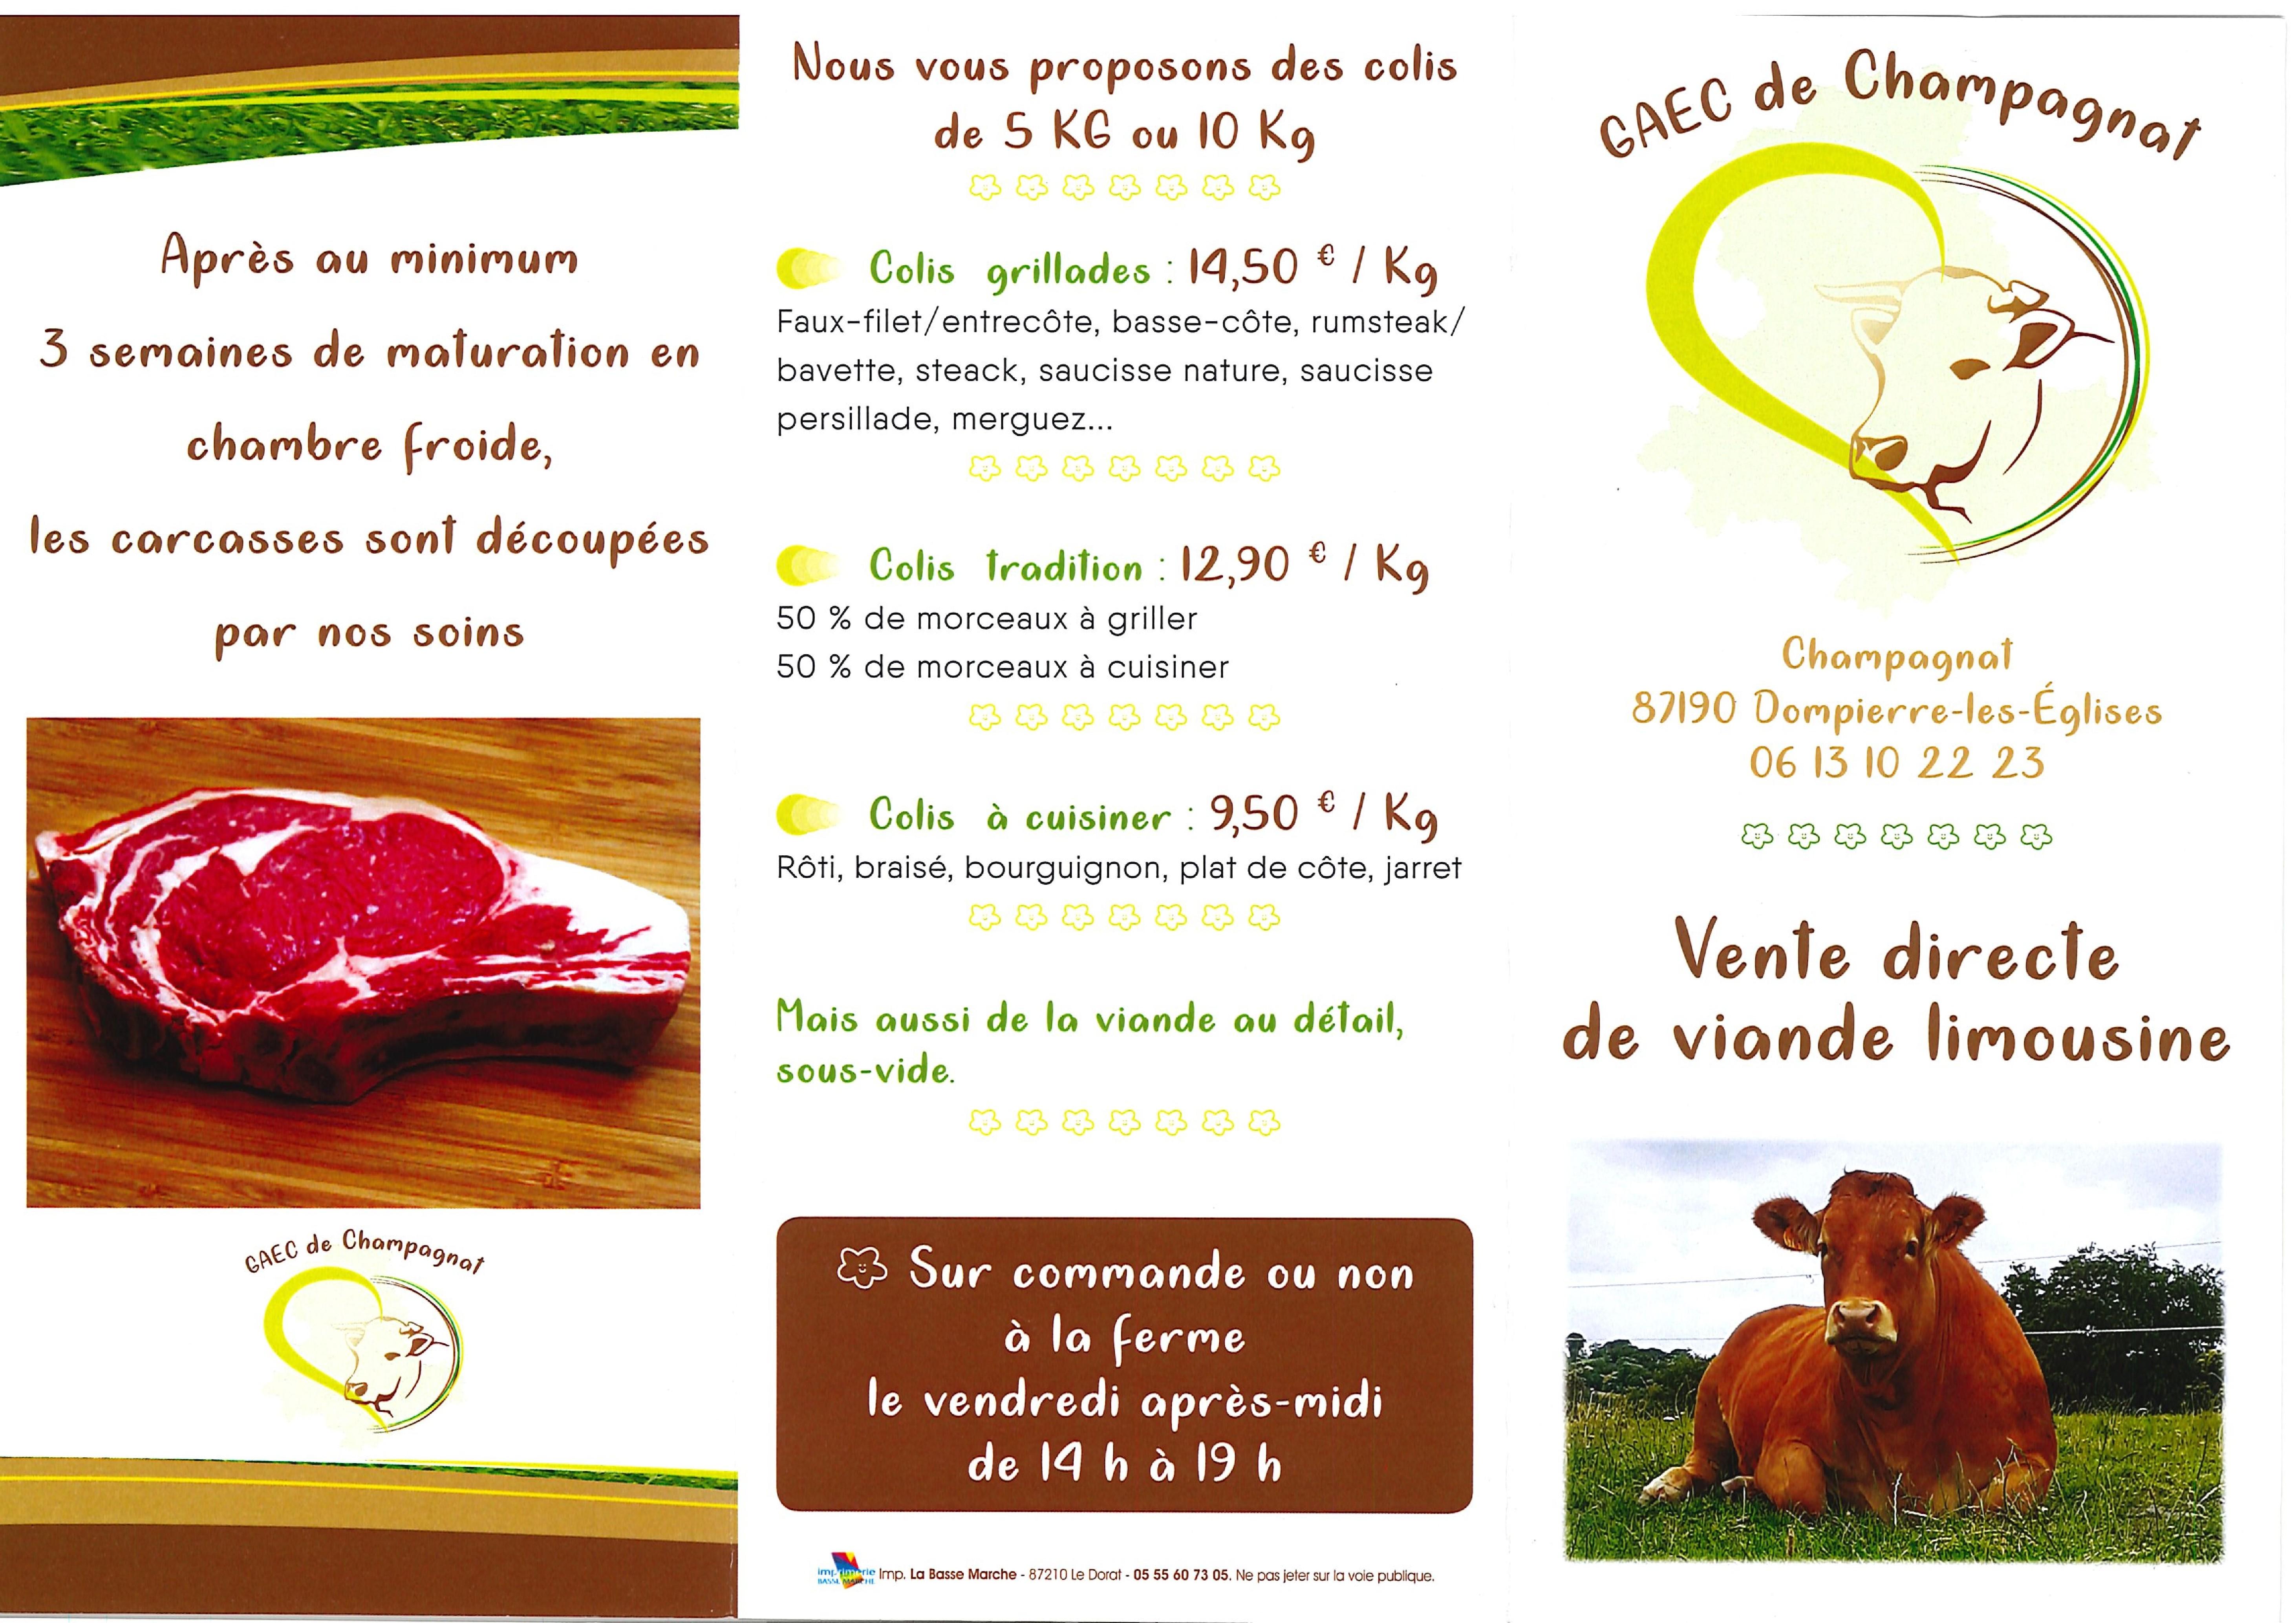 Gaec Champagnat Verso.jpg